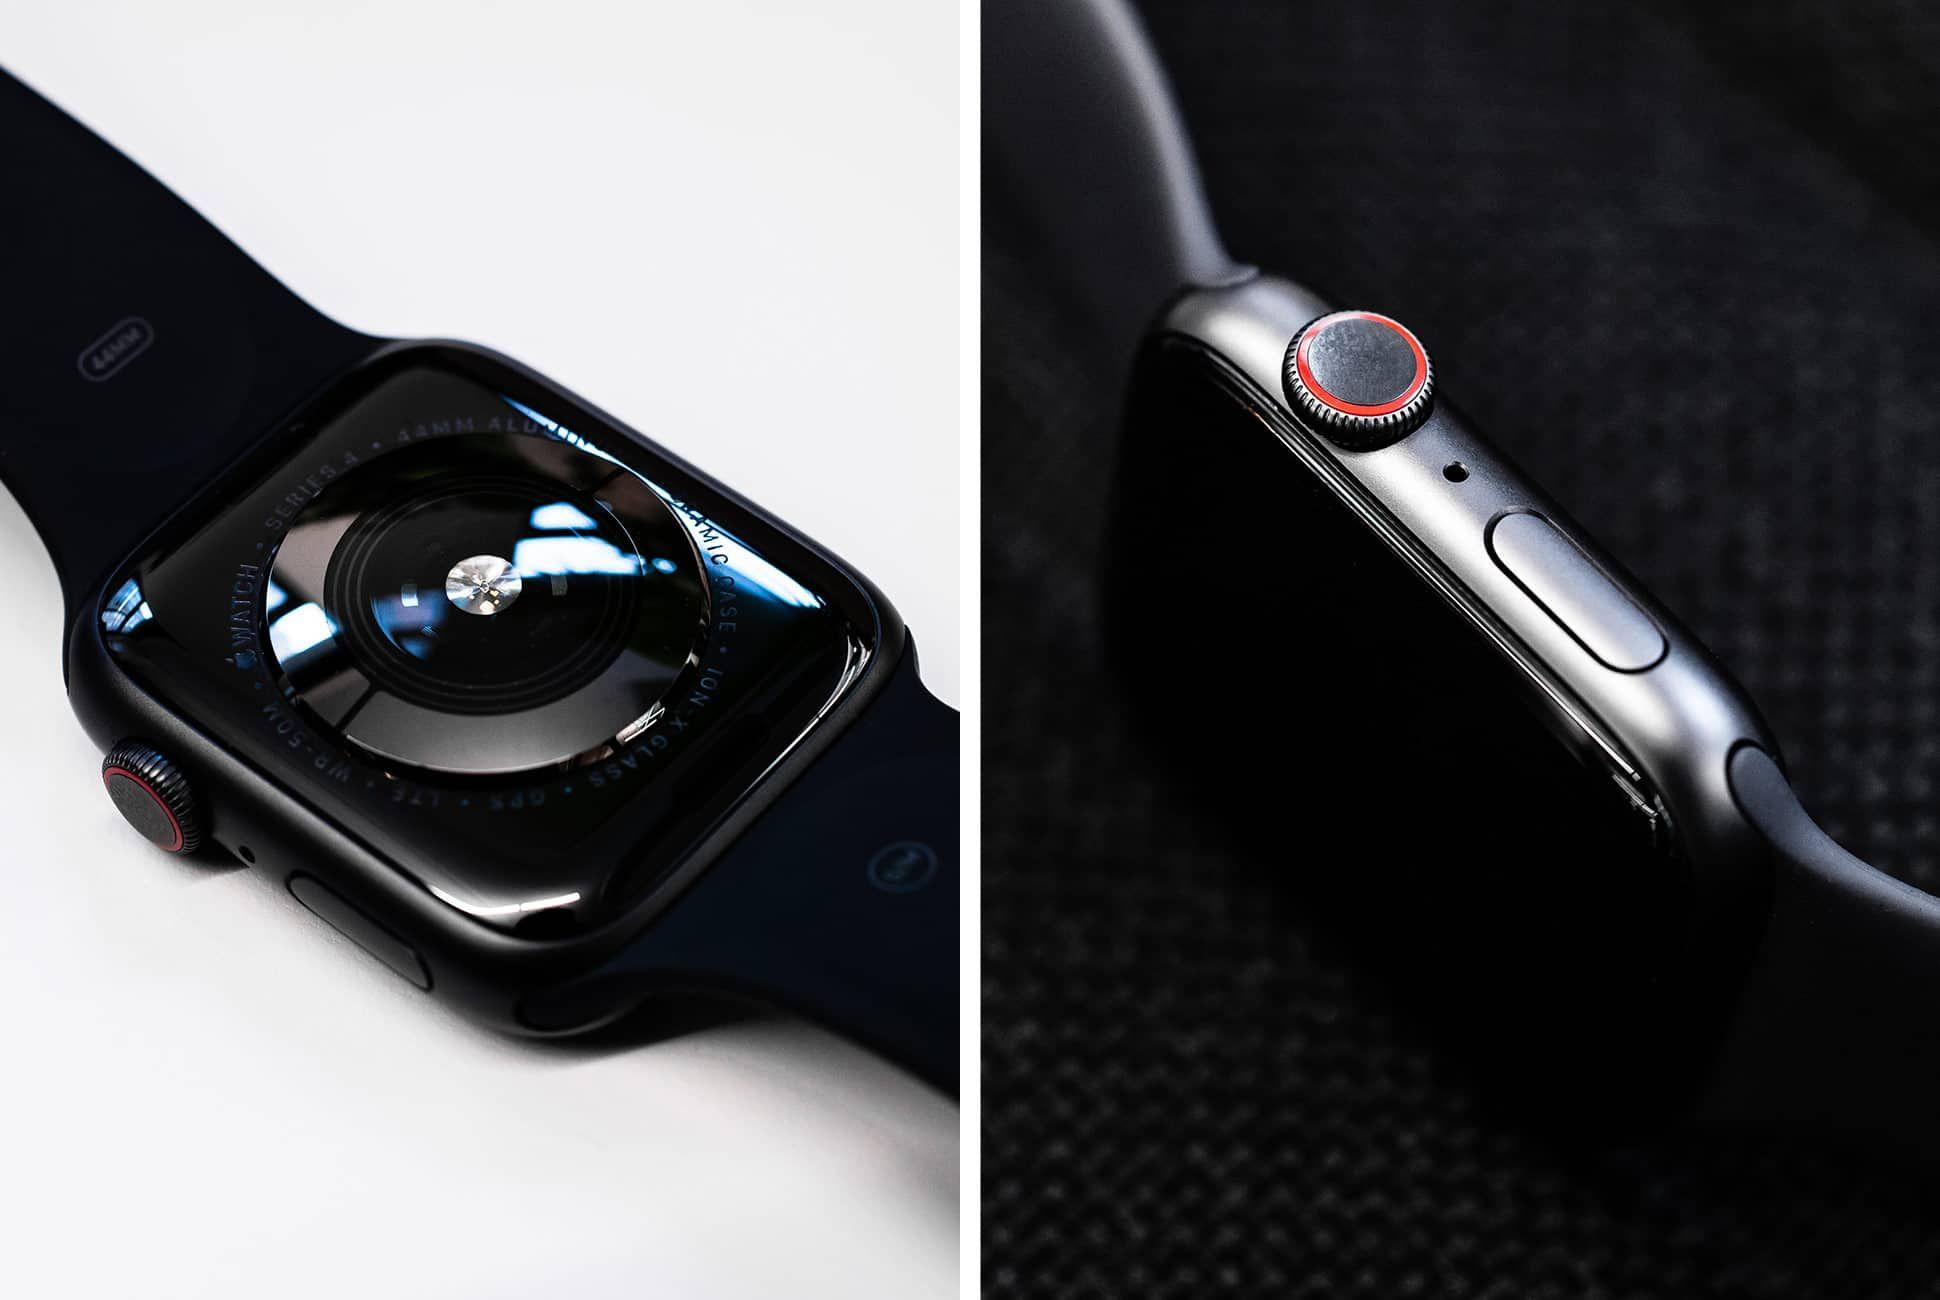 Apple-Watch-Series-4-Review-gear-patrol-slide-3